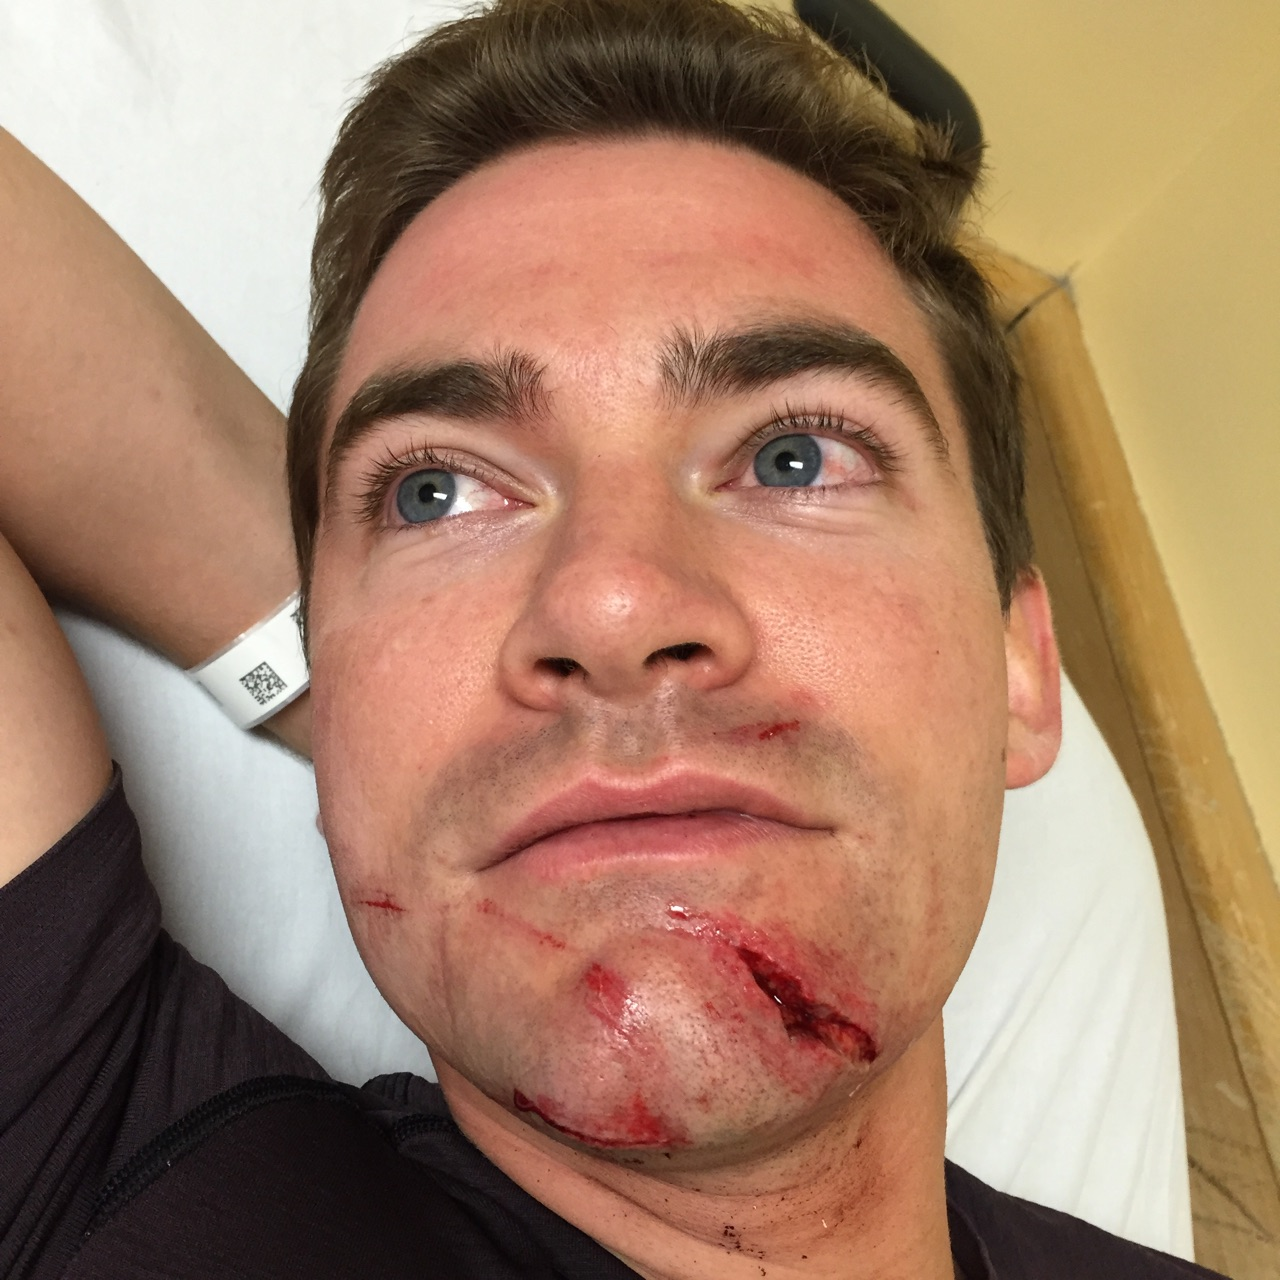 Grandson of famed broadcaster recounts slashing attack in D.C.